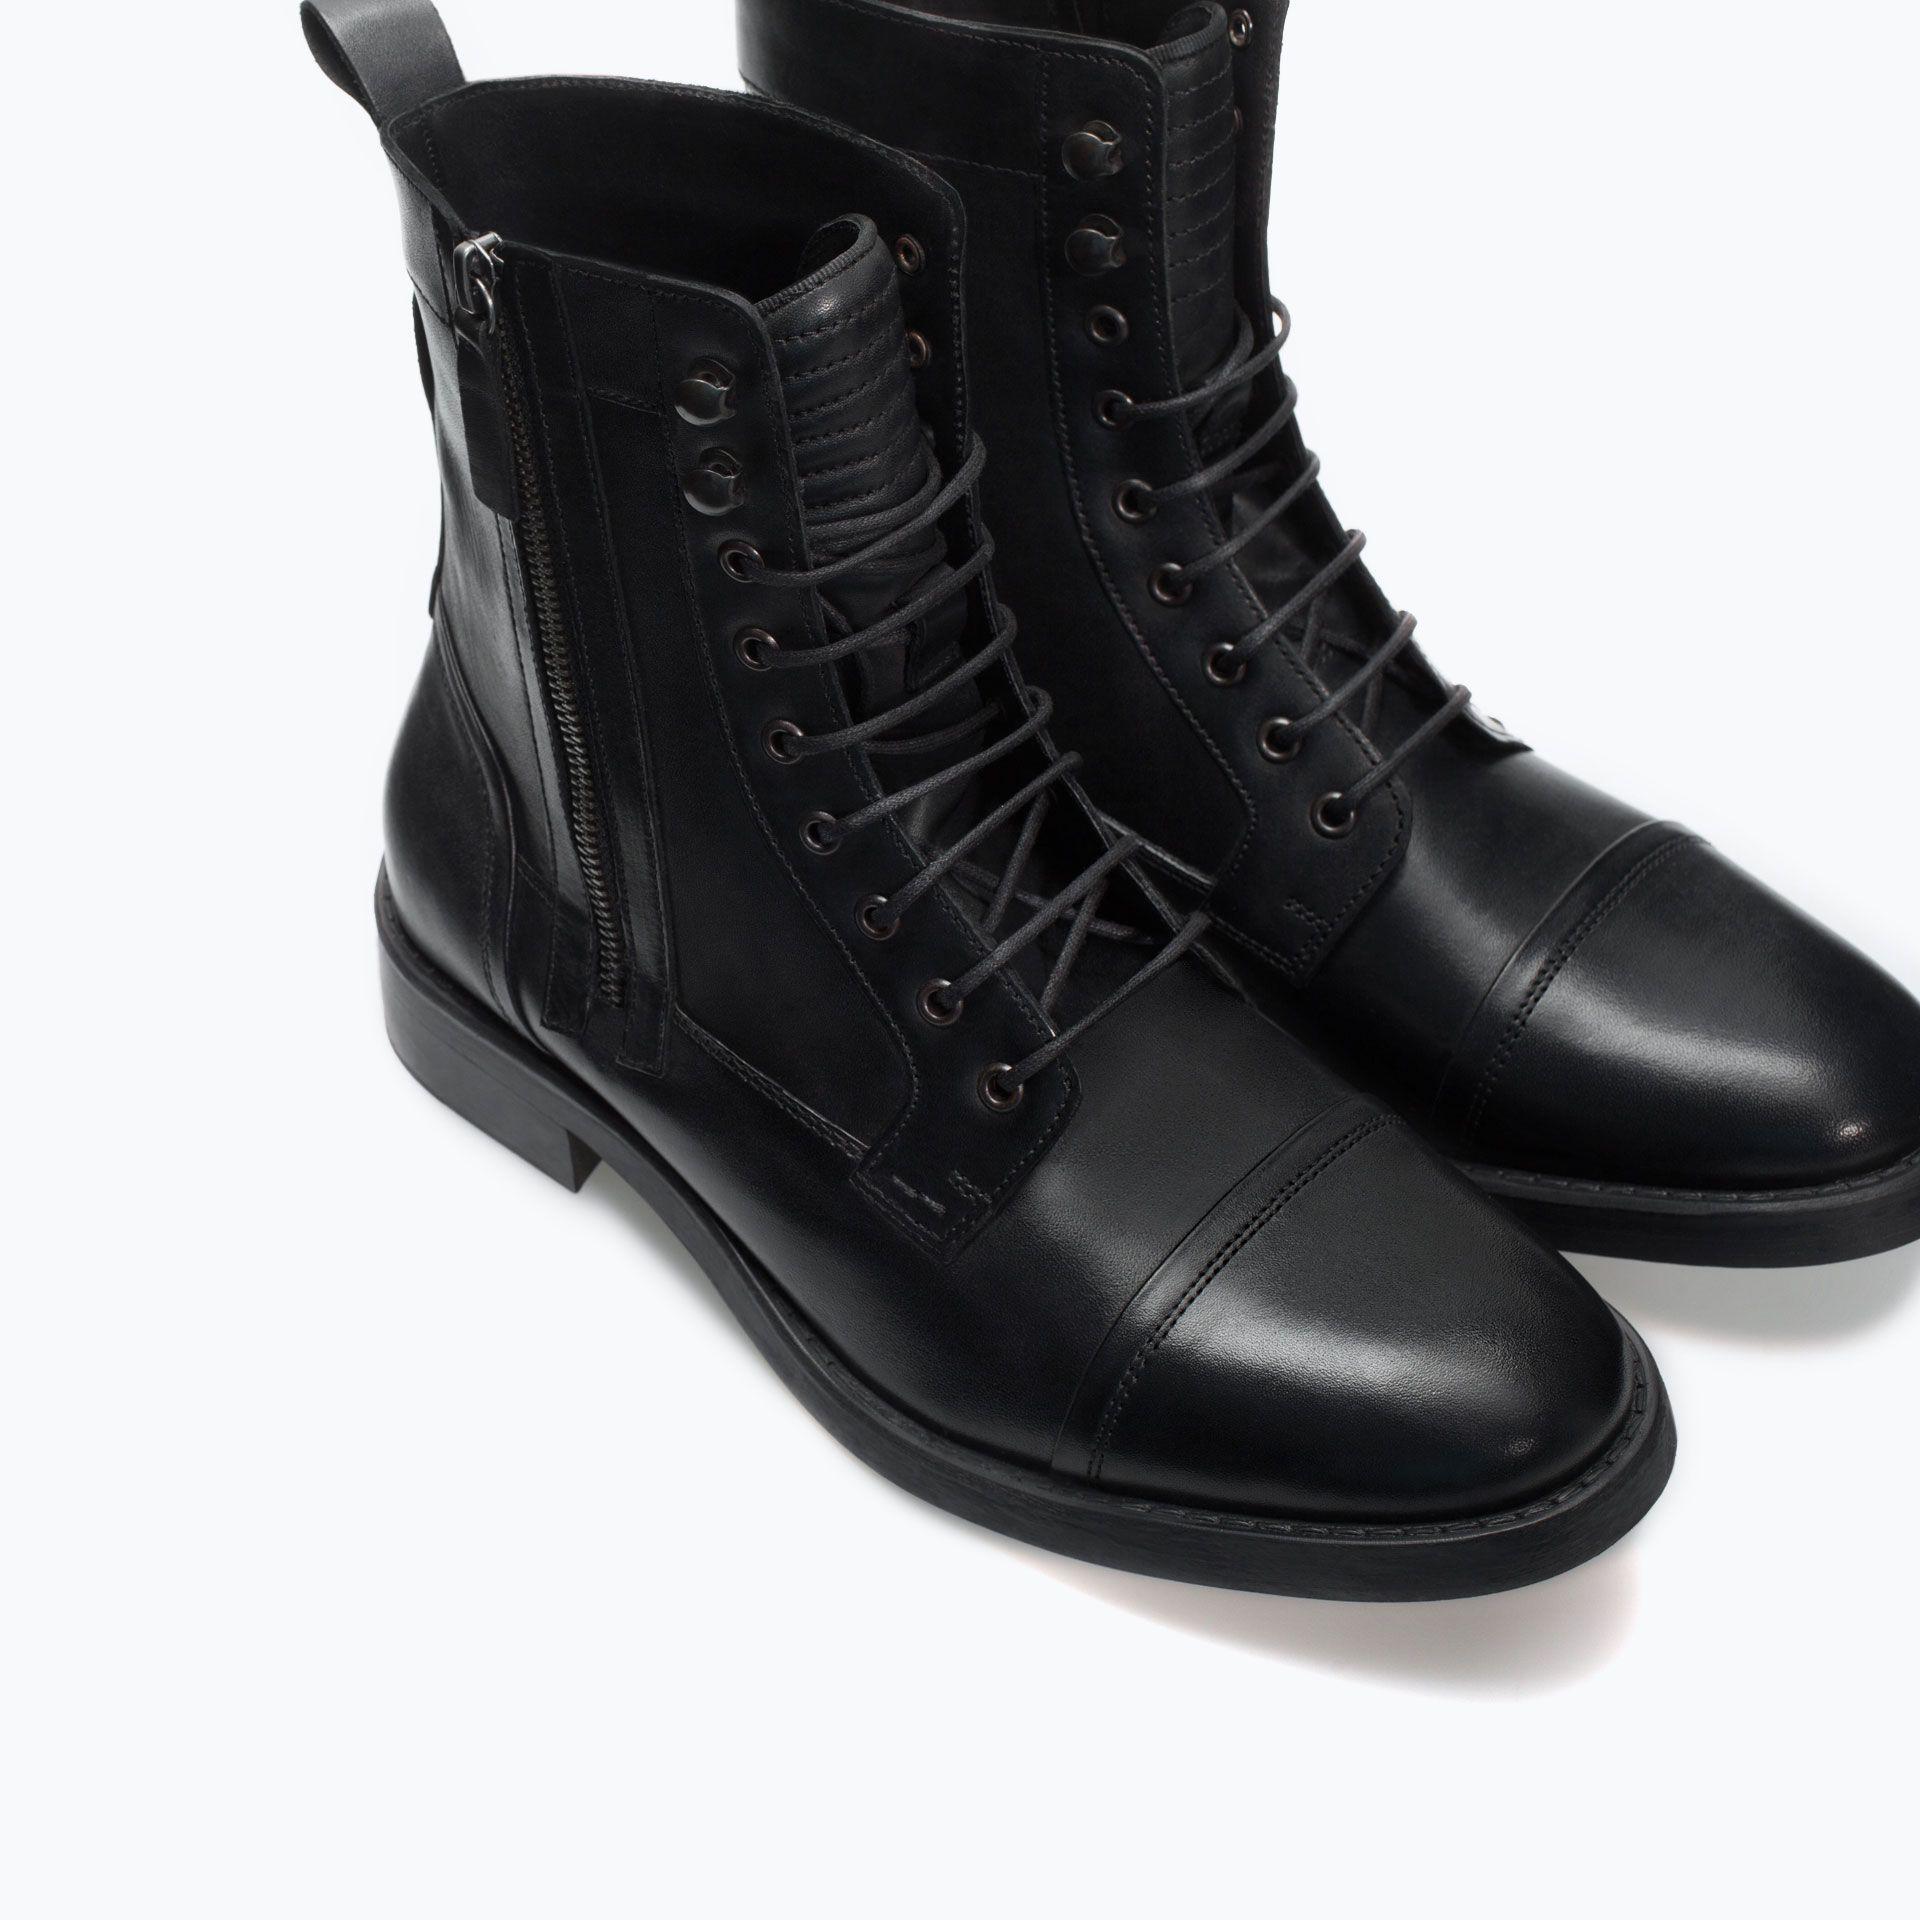 Haforever Retro Combat Boots Mens Road Captain Motorcycle Boots